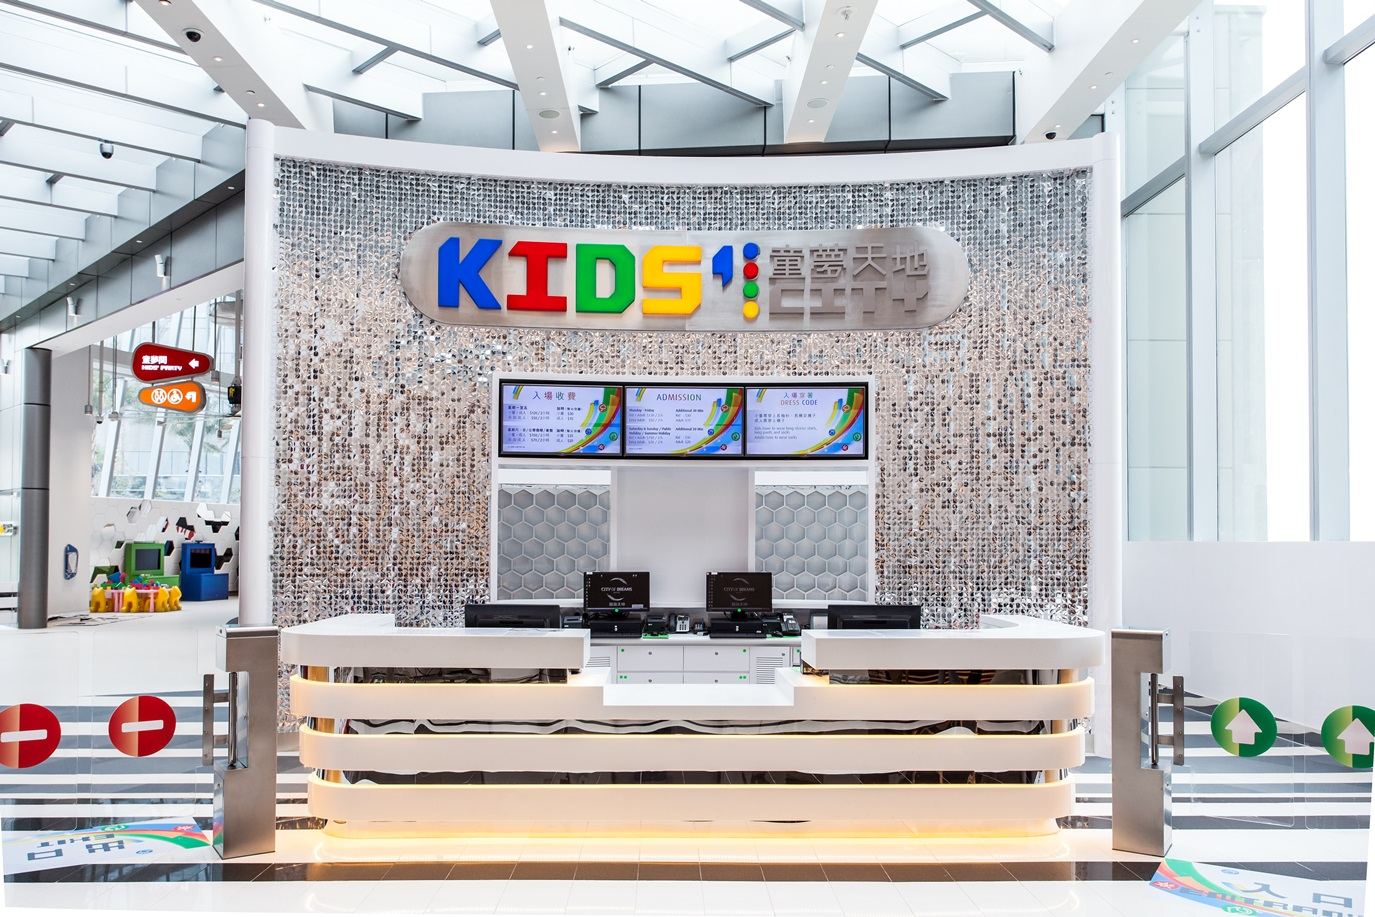 Kids' City Macau: Entrance